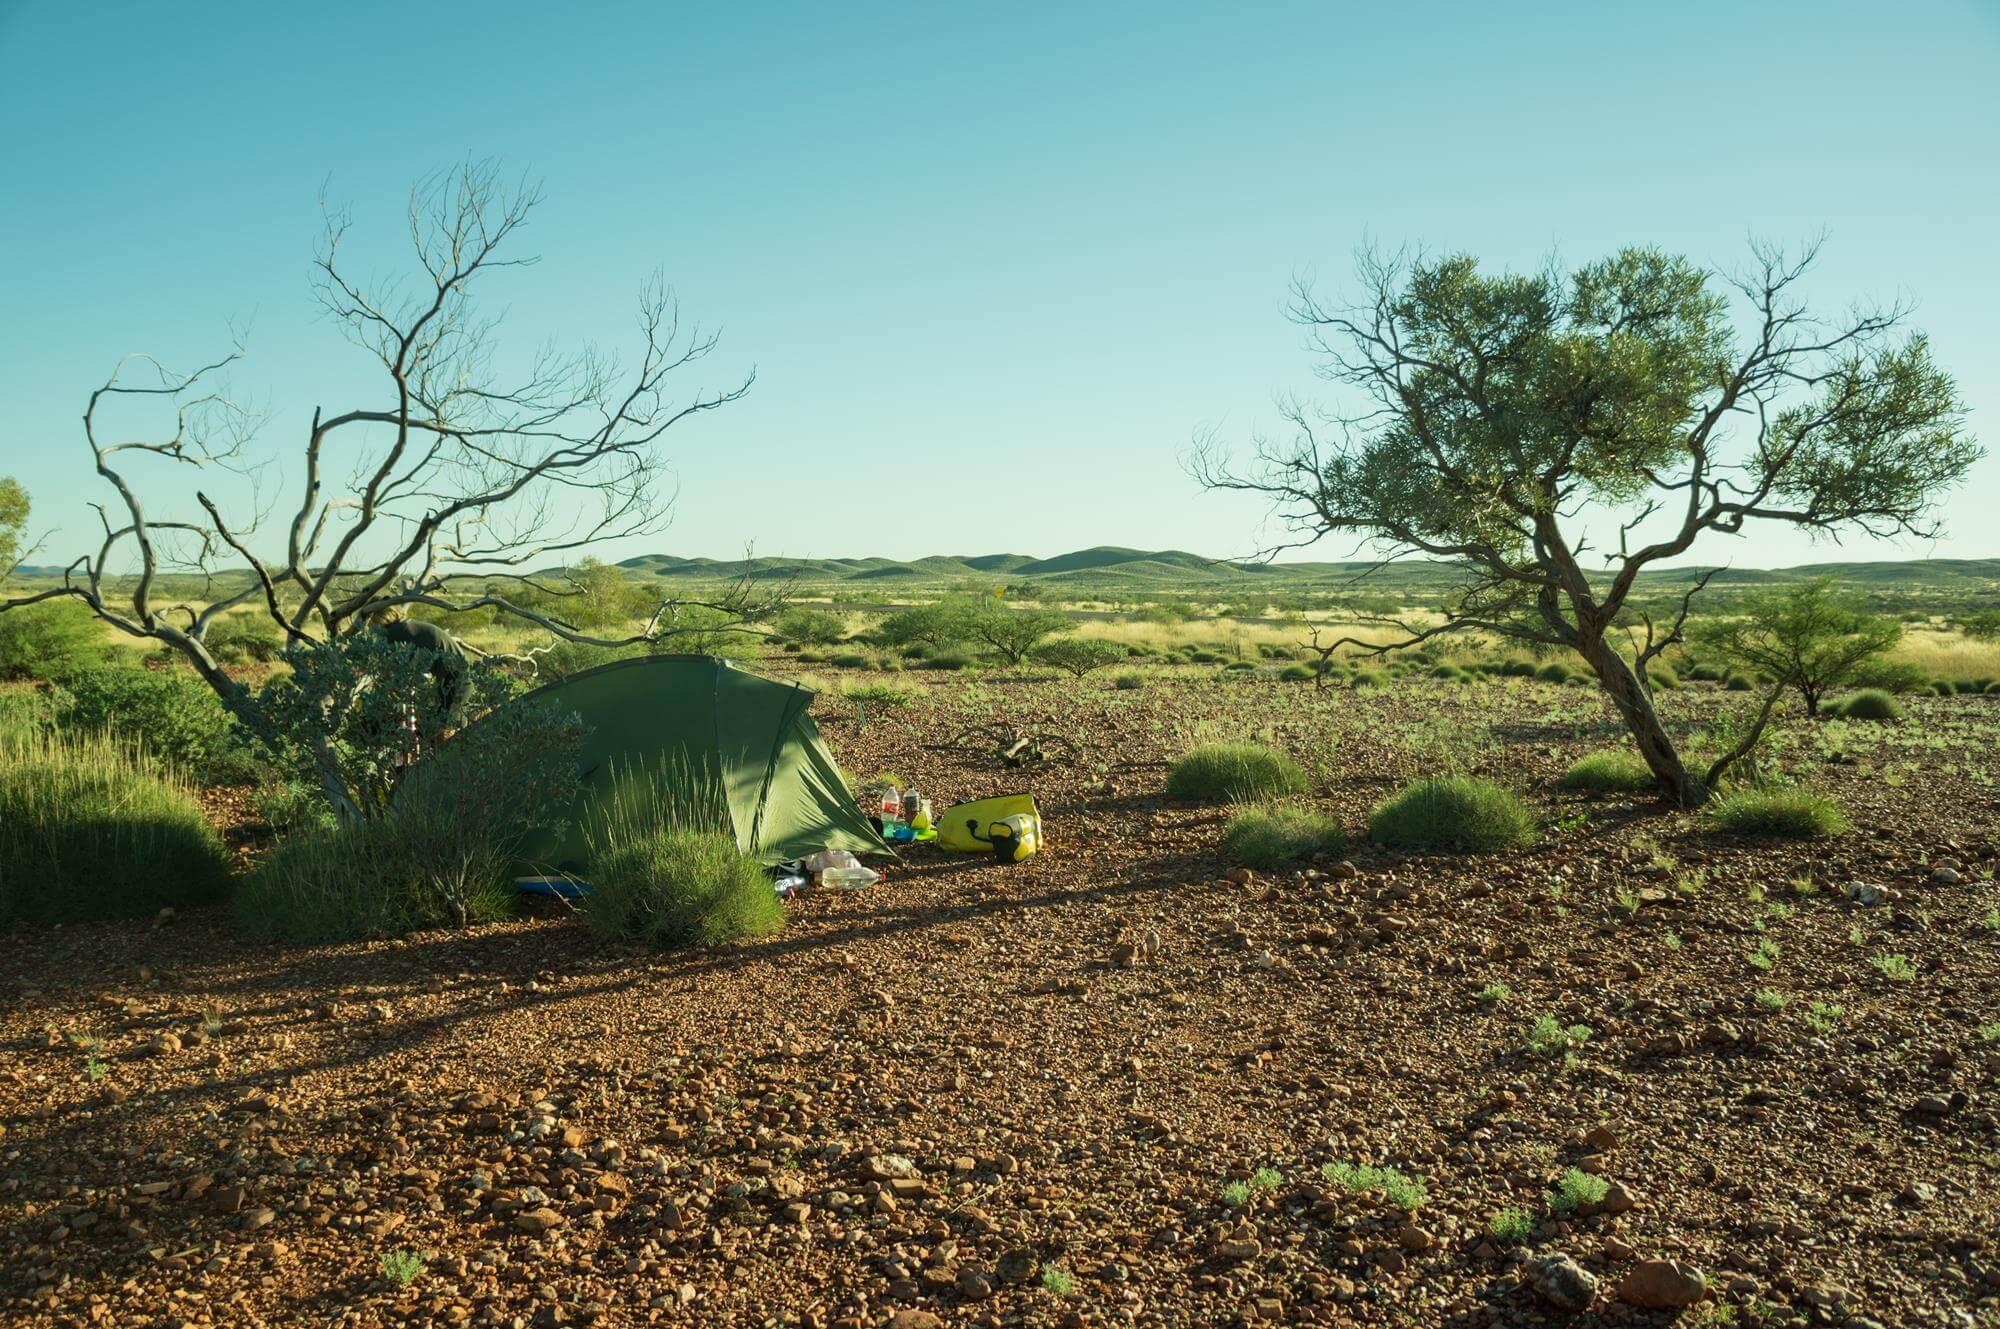 australia-pilbara-przestrzen